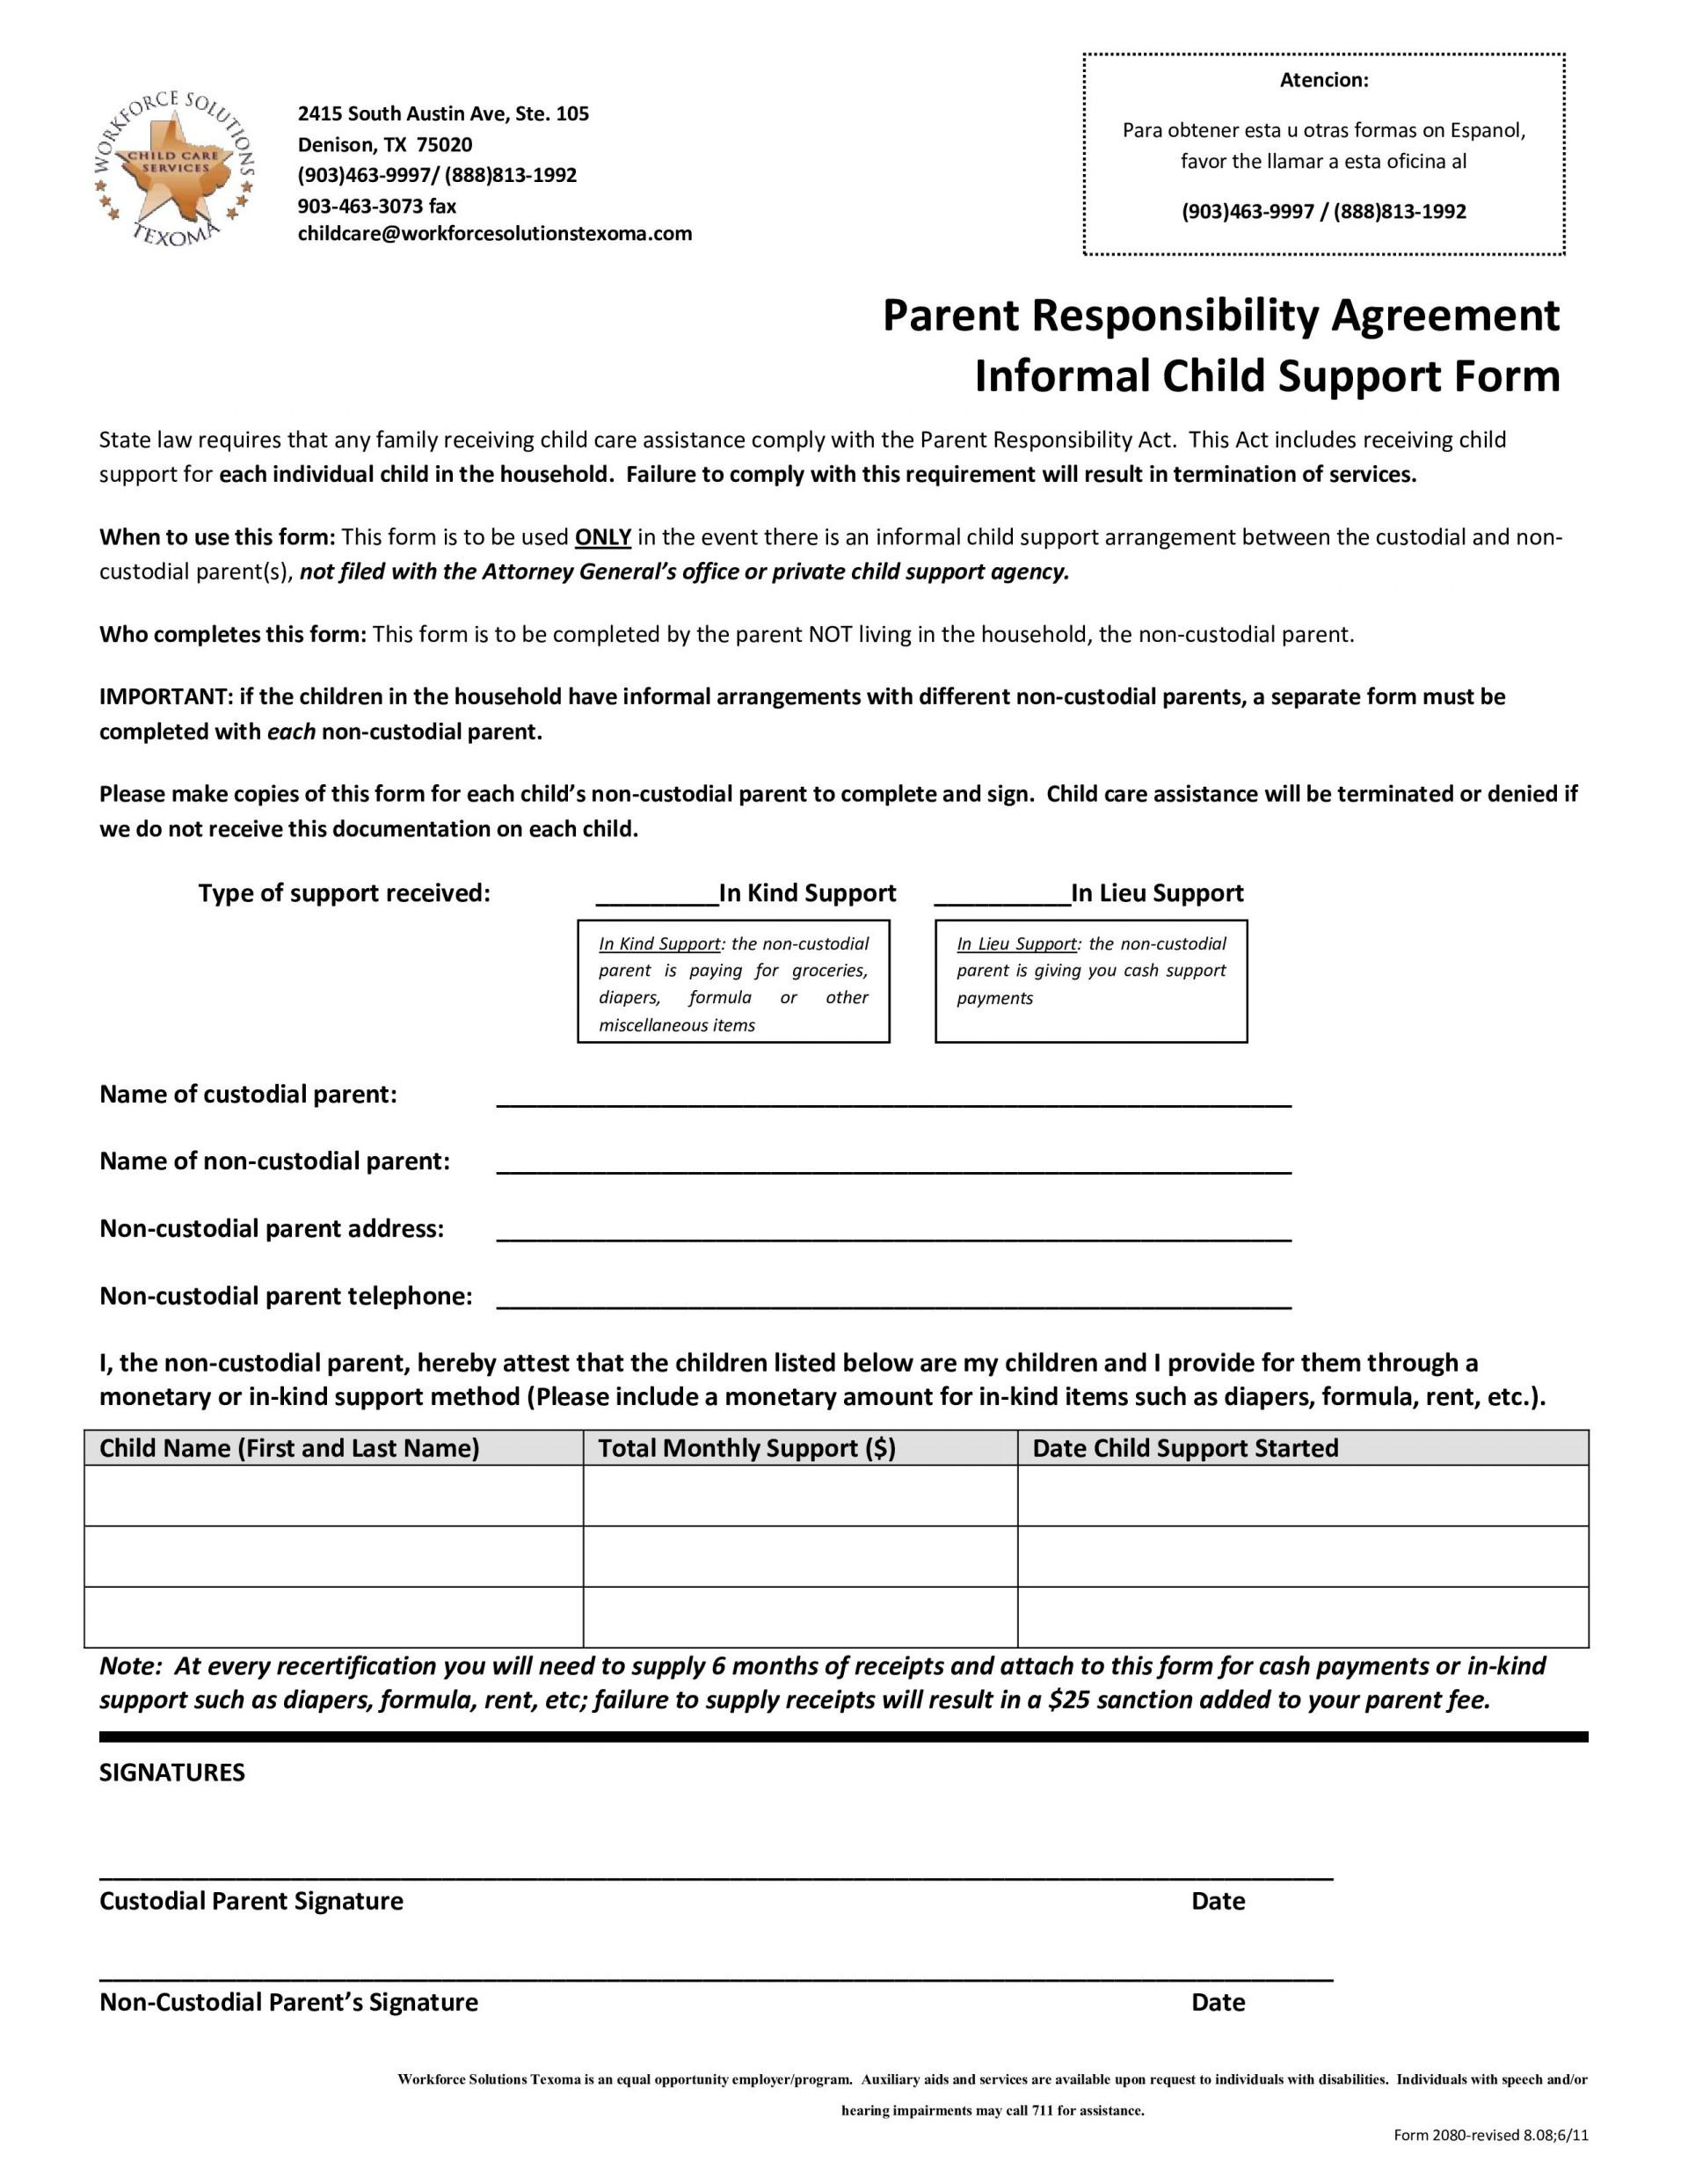 003 Striking Child Support Agreement Template Concept  Australia Bc Alberta1920